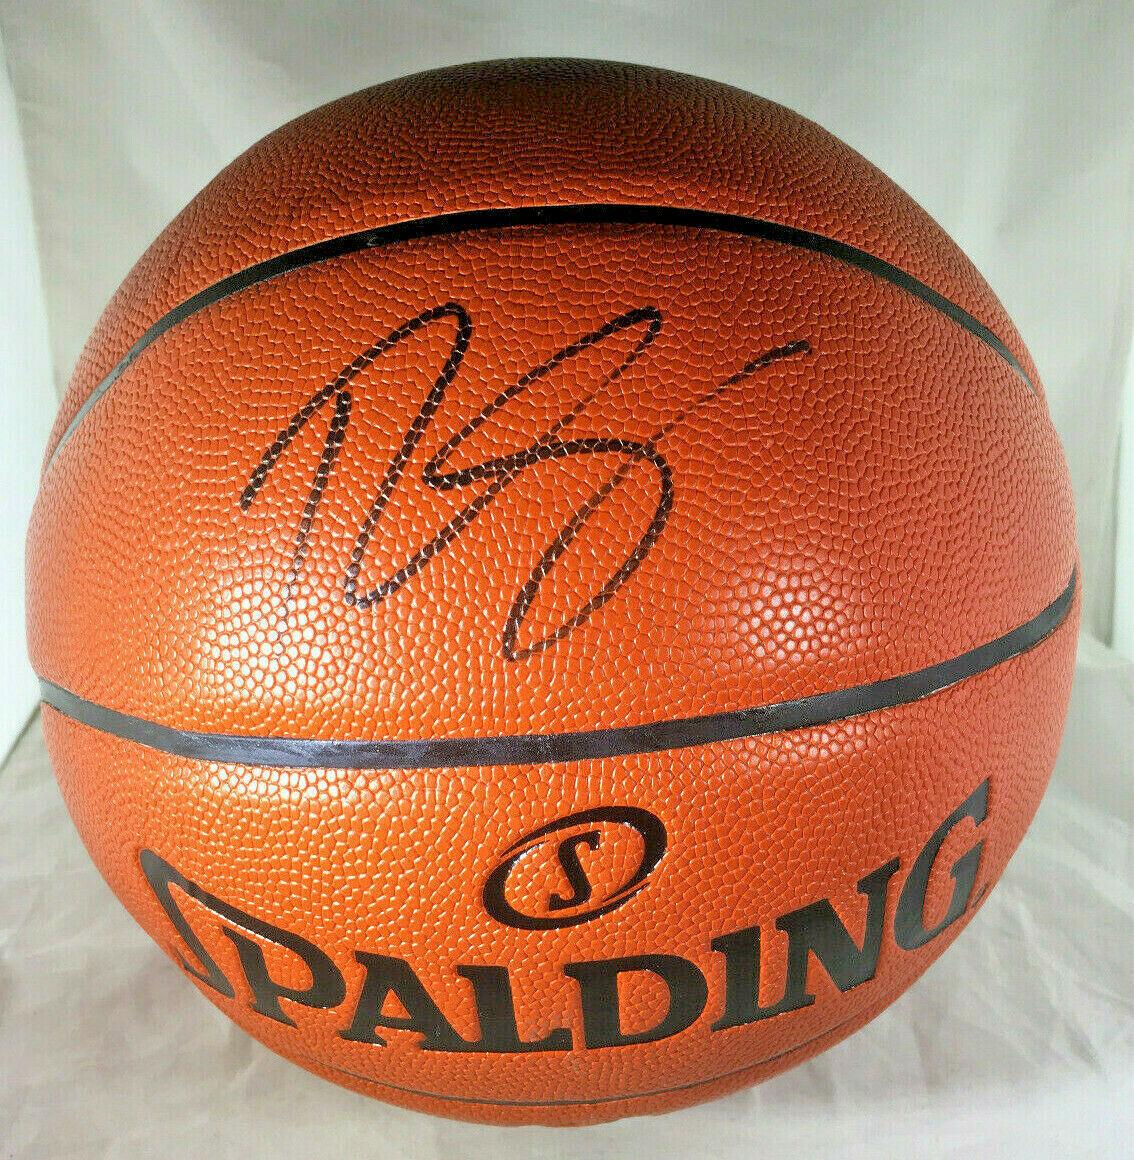 BEN SIMMONS / PHILADELPHIA 76ERS / AUTOGRAPHED FULL SIZE NBA BASKETBALL / COA